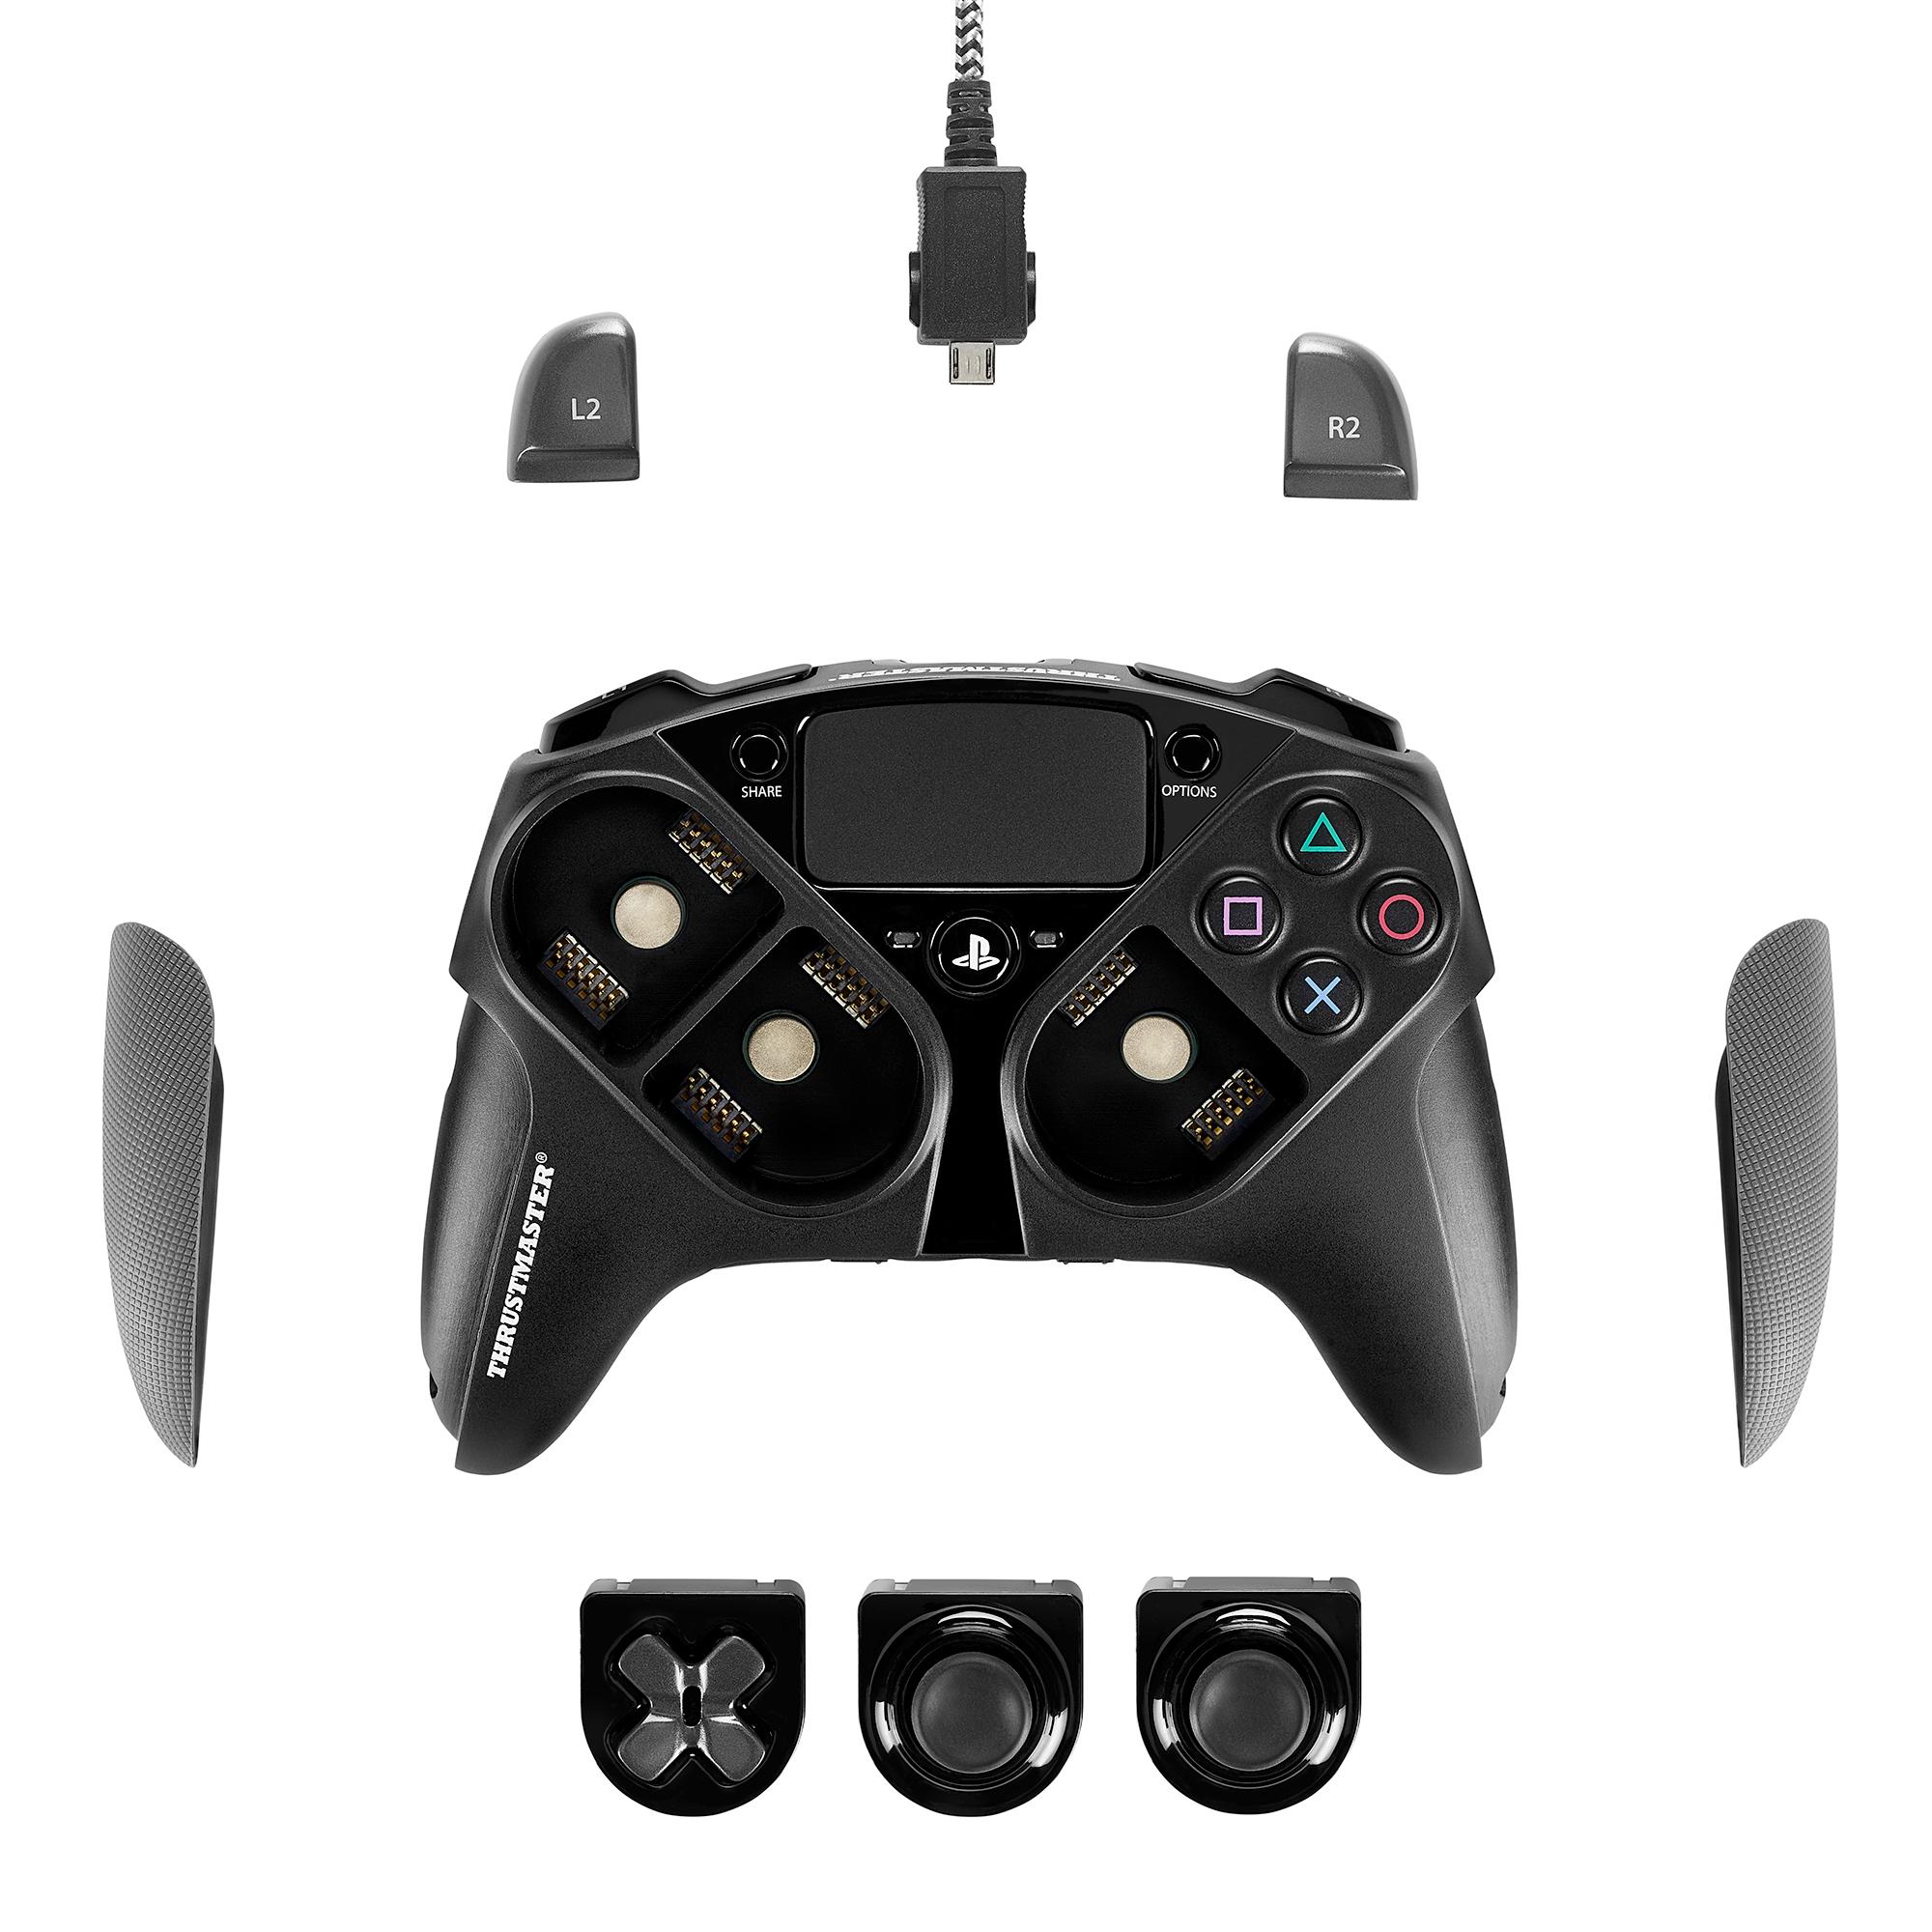 Thrustmaster eSwap Pro Controller (Gamepad, PS4 / PC)